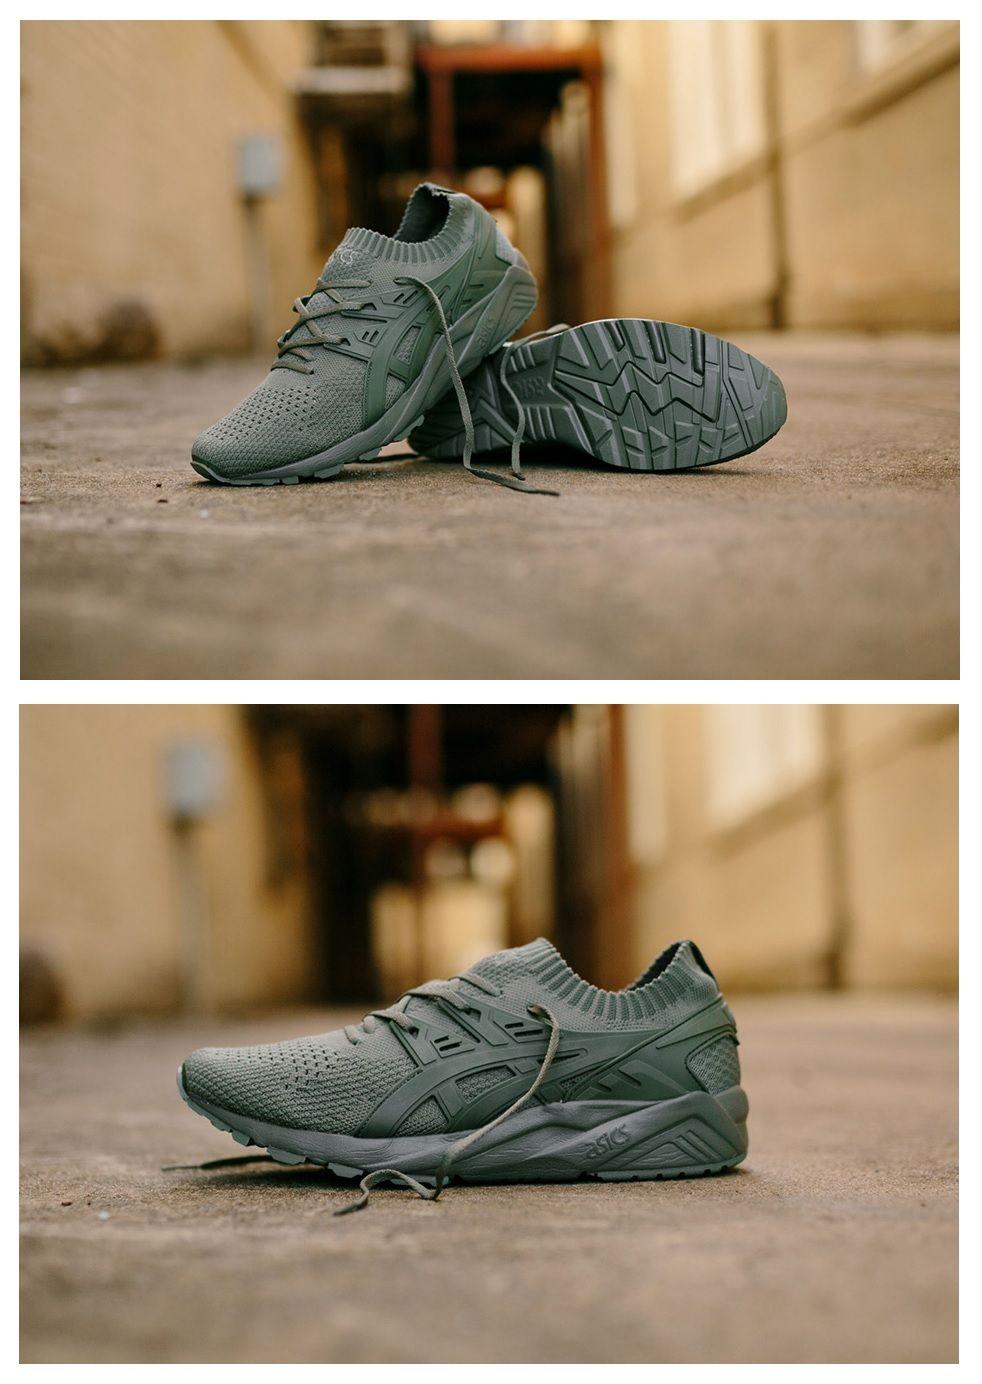 best loved b12b8 1ec92 Asics Gel Kayano Knit: Agave Green | Sneakers: Asics Gel ...